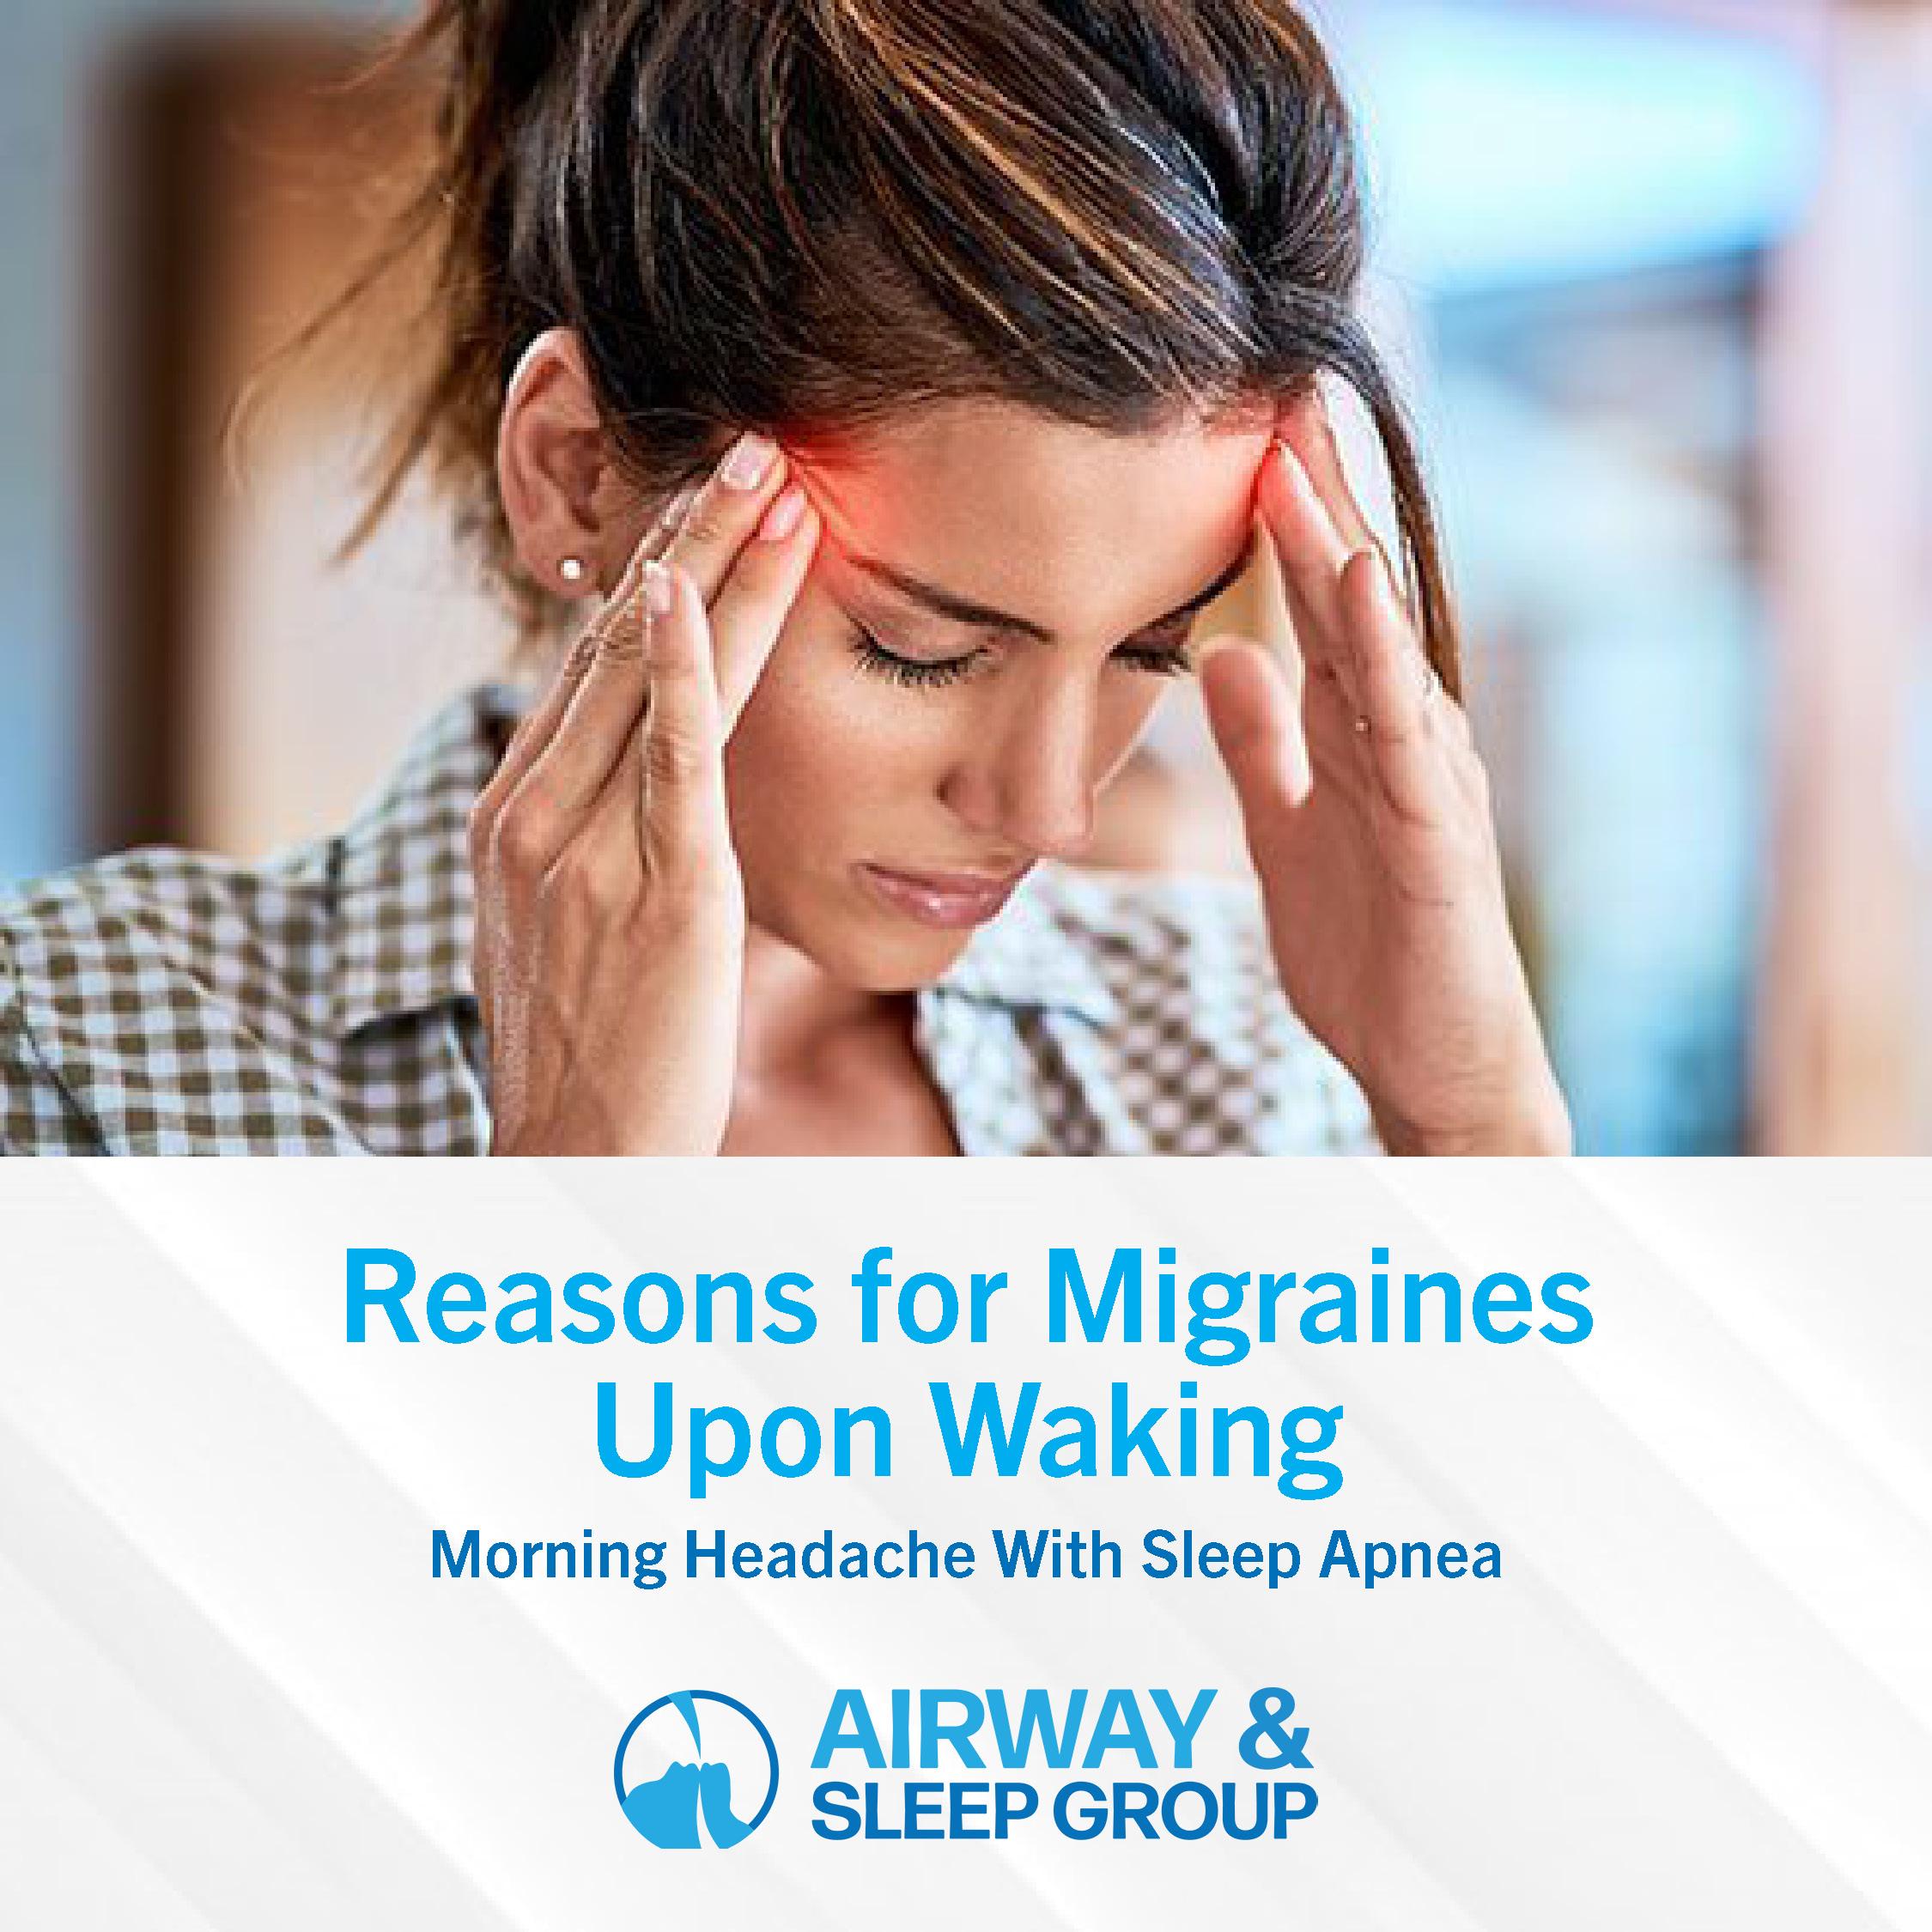 Morning Headache with Sleep Apnea